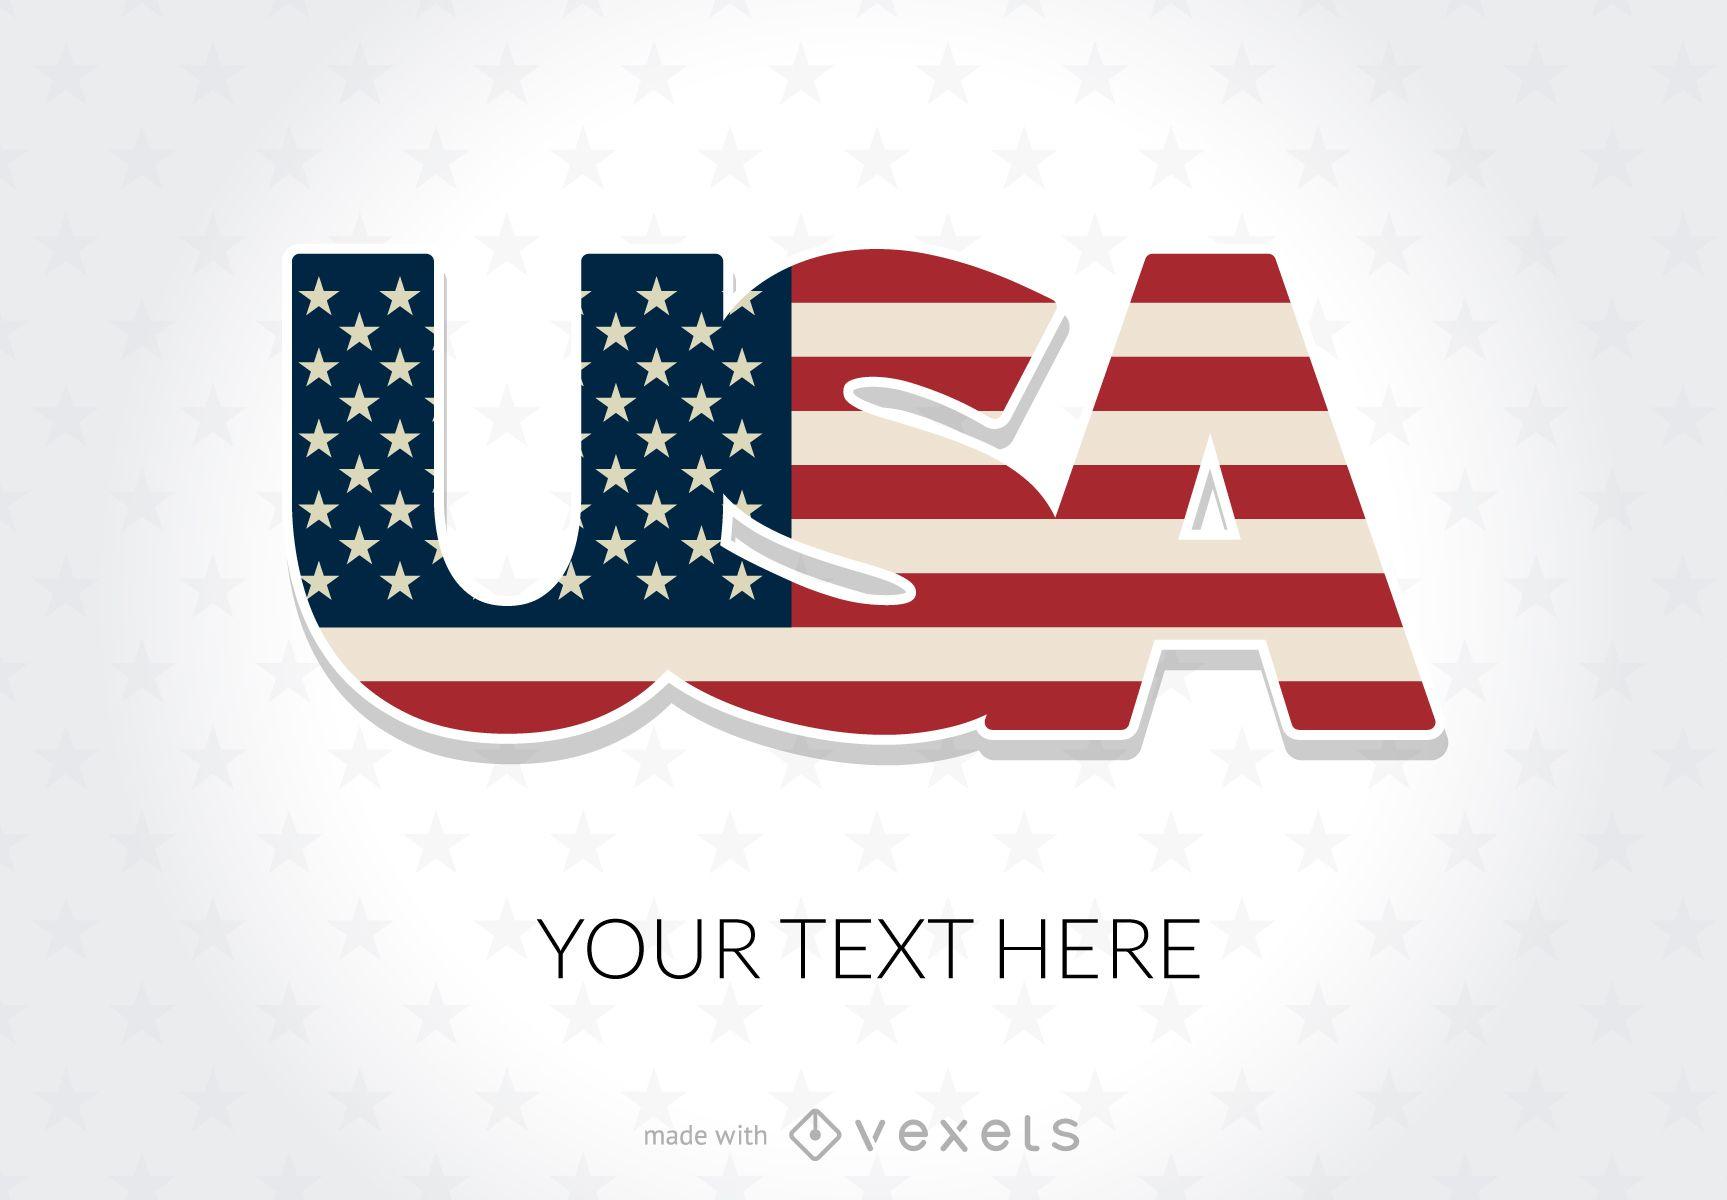 USA holidays poster maker